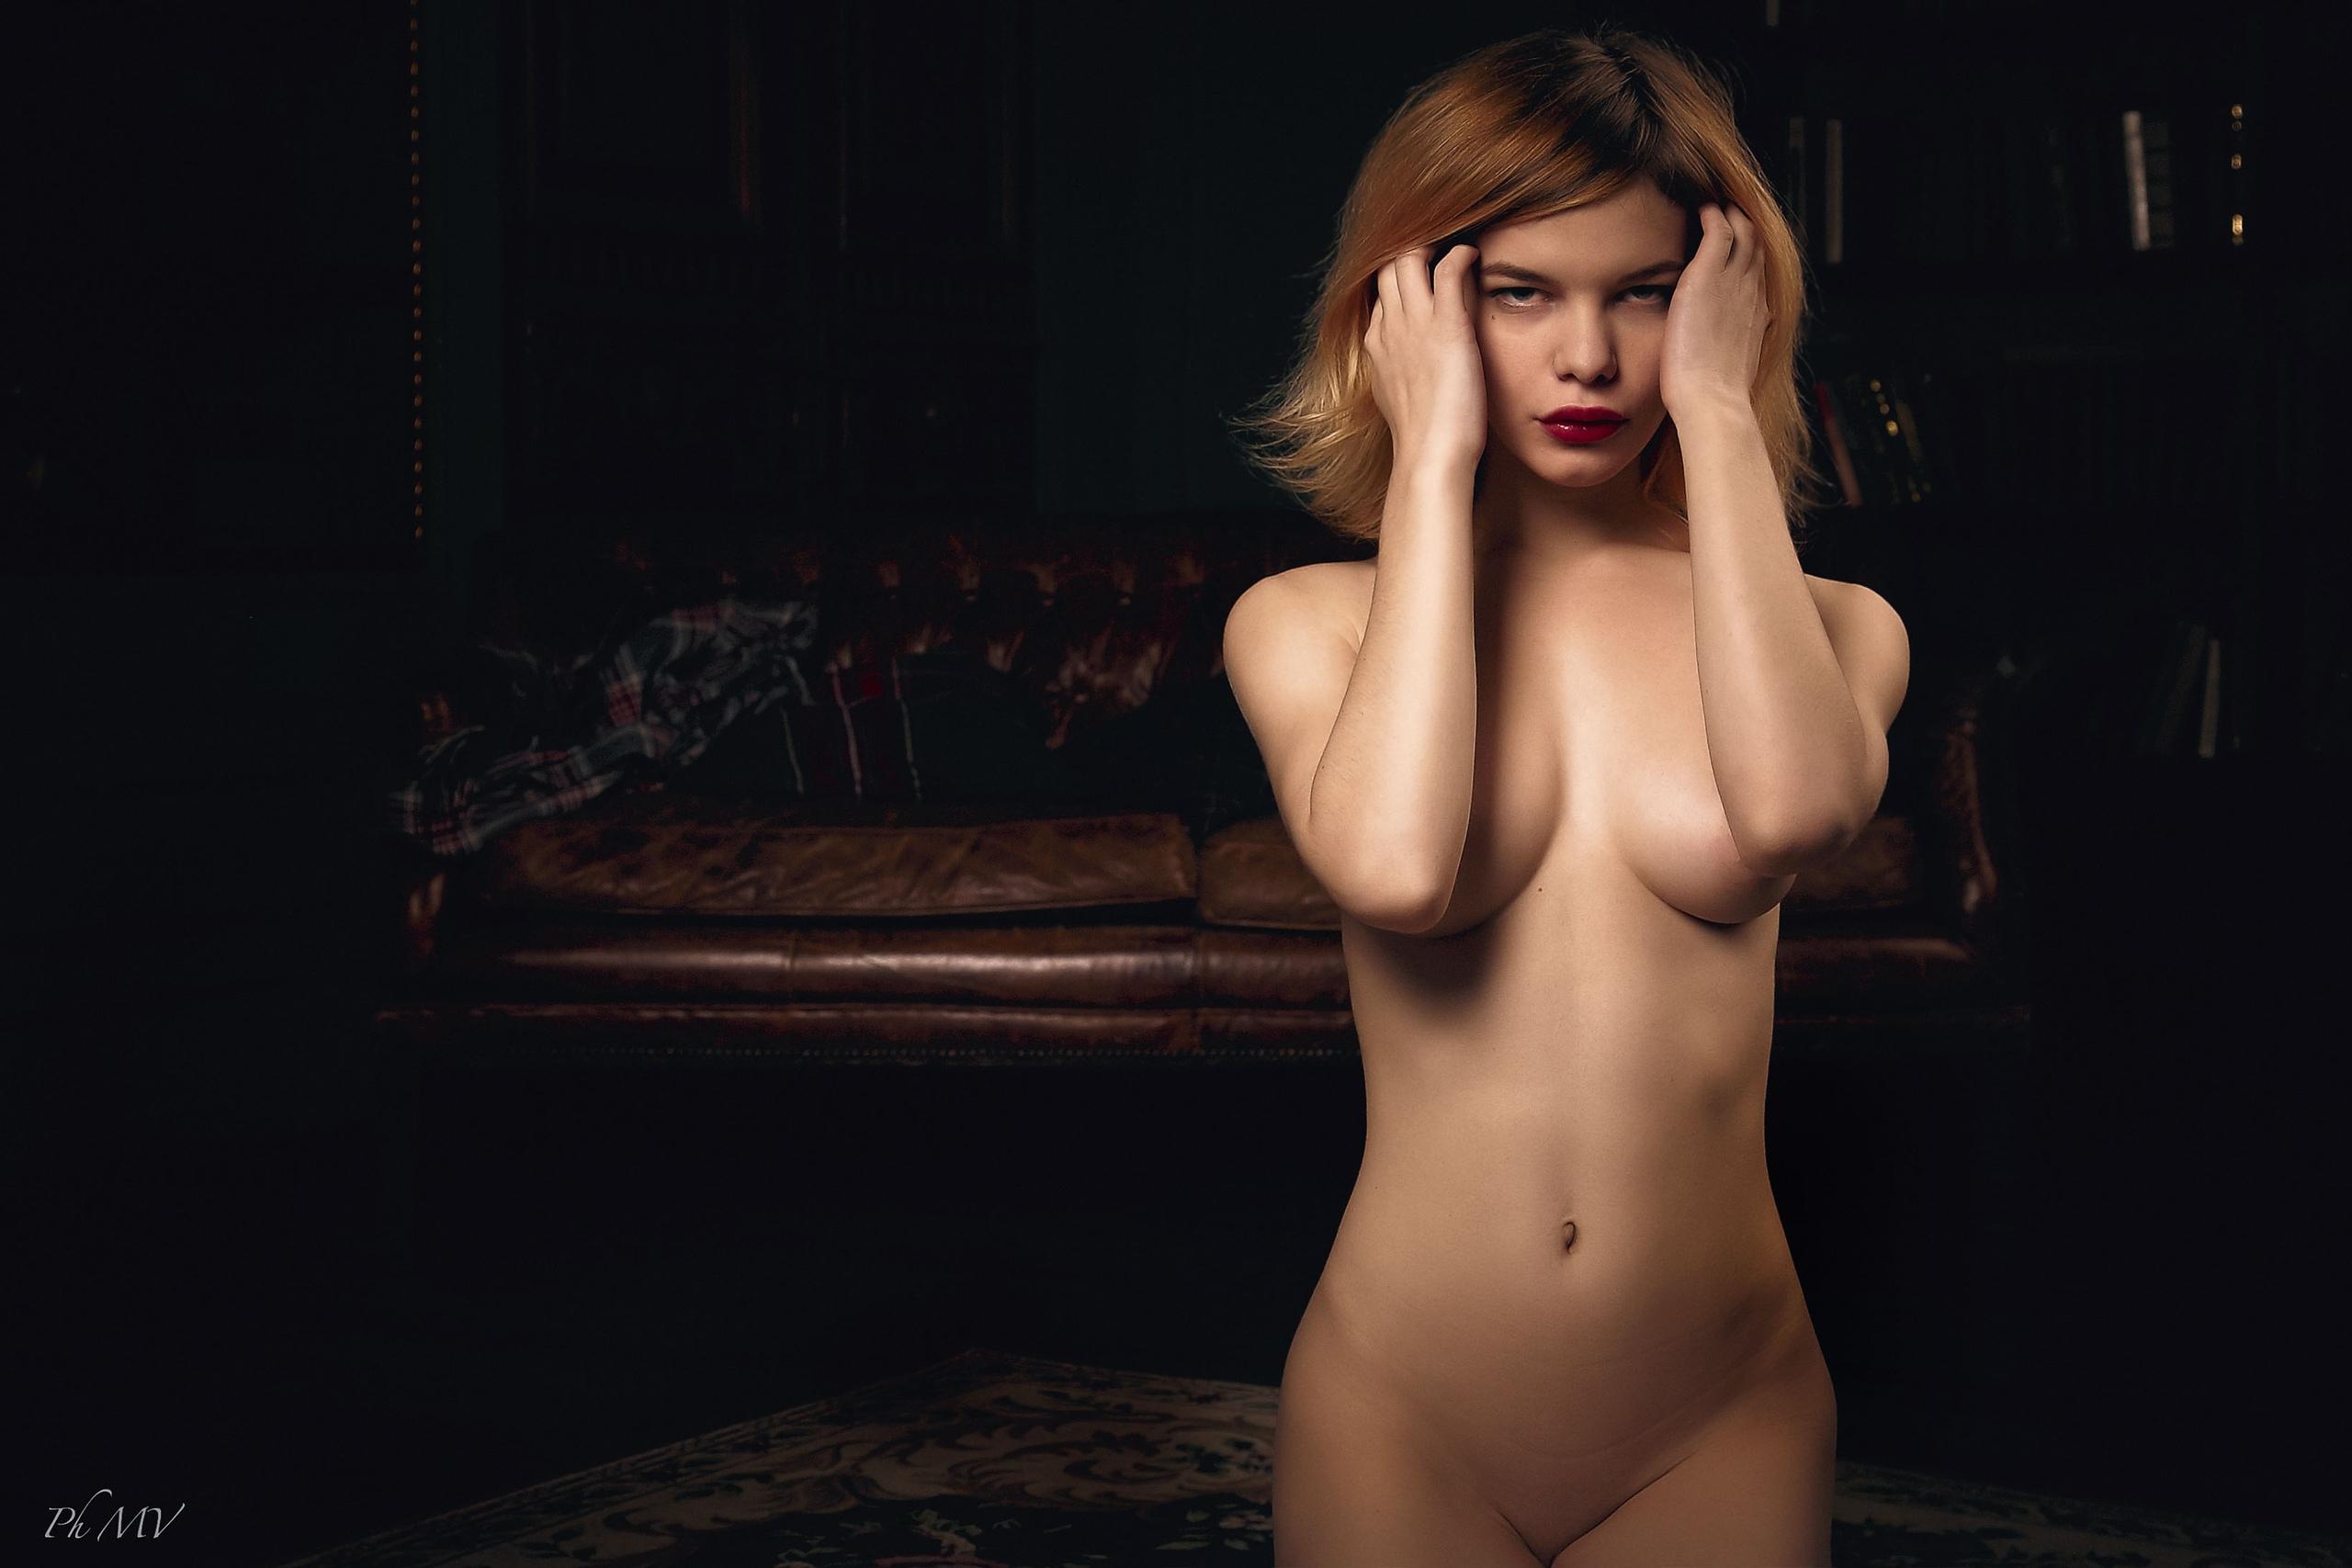 Maria Zaitseva by Maik Voznik II (NSFW)